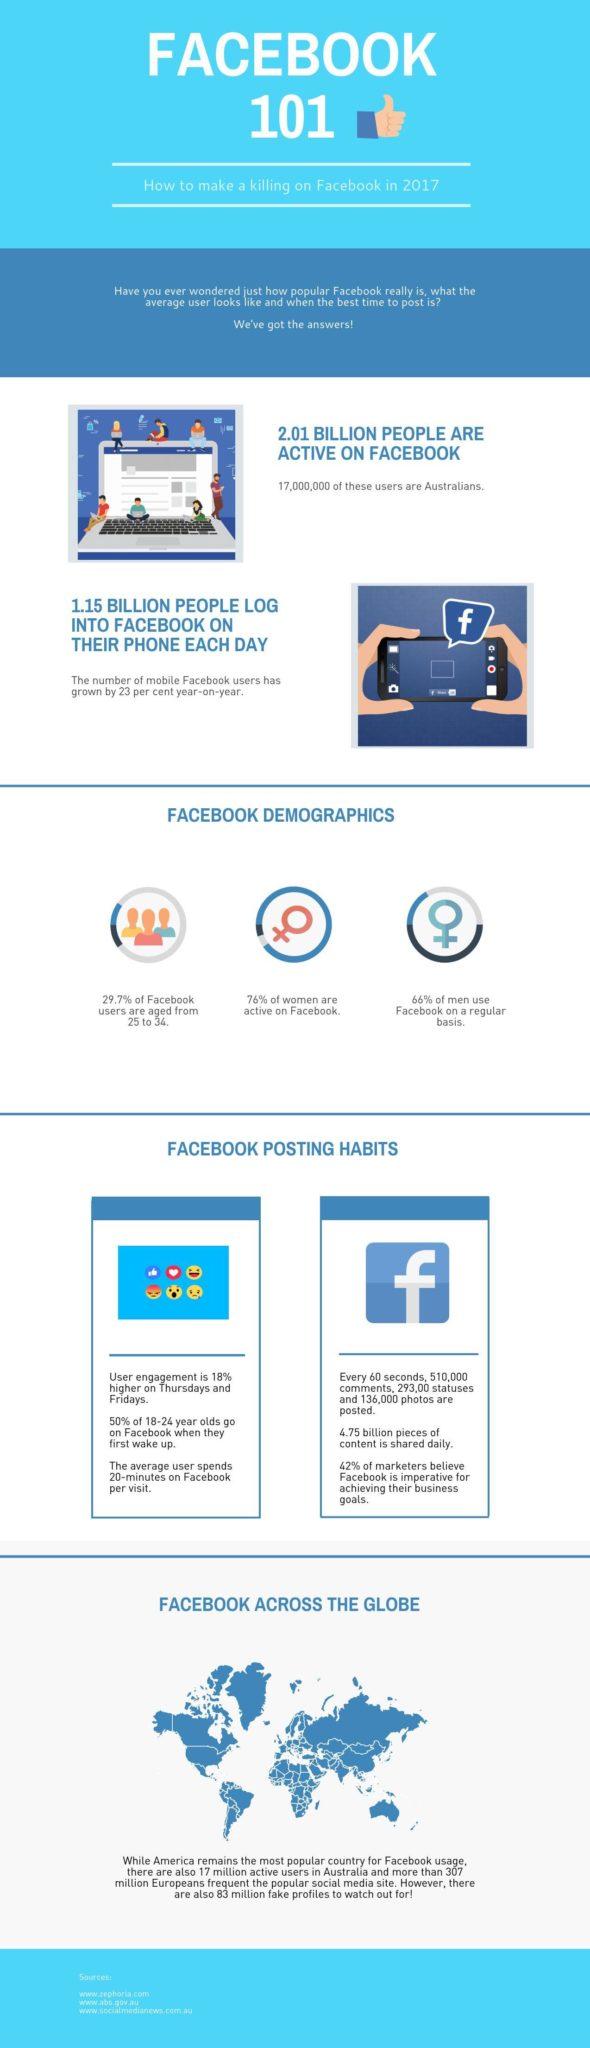 Facebook usage stats 2017